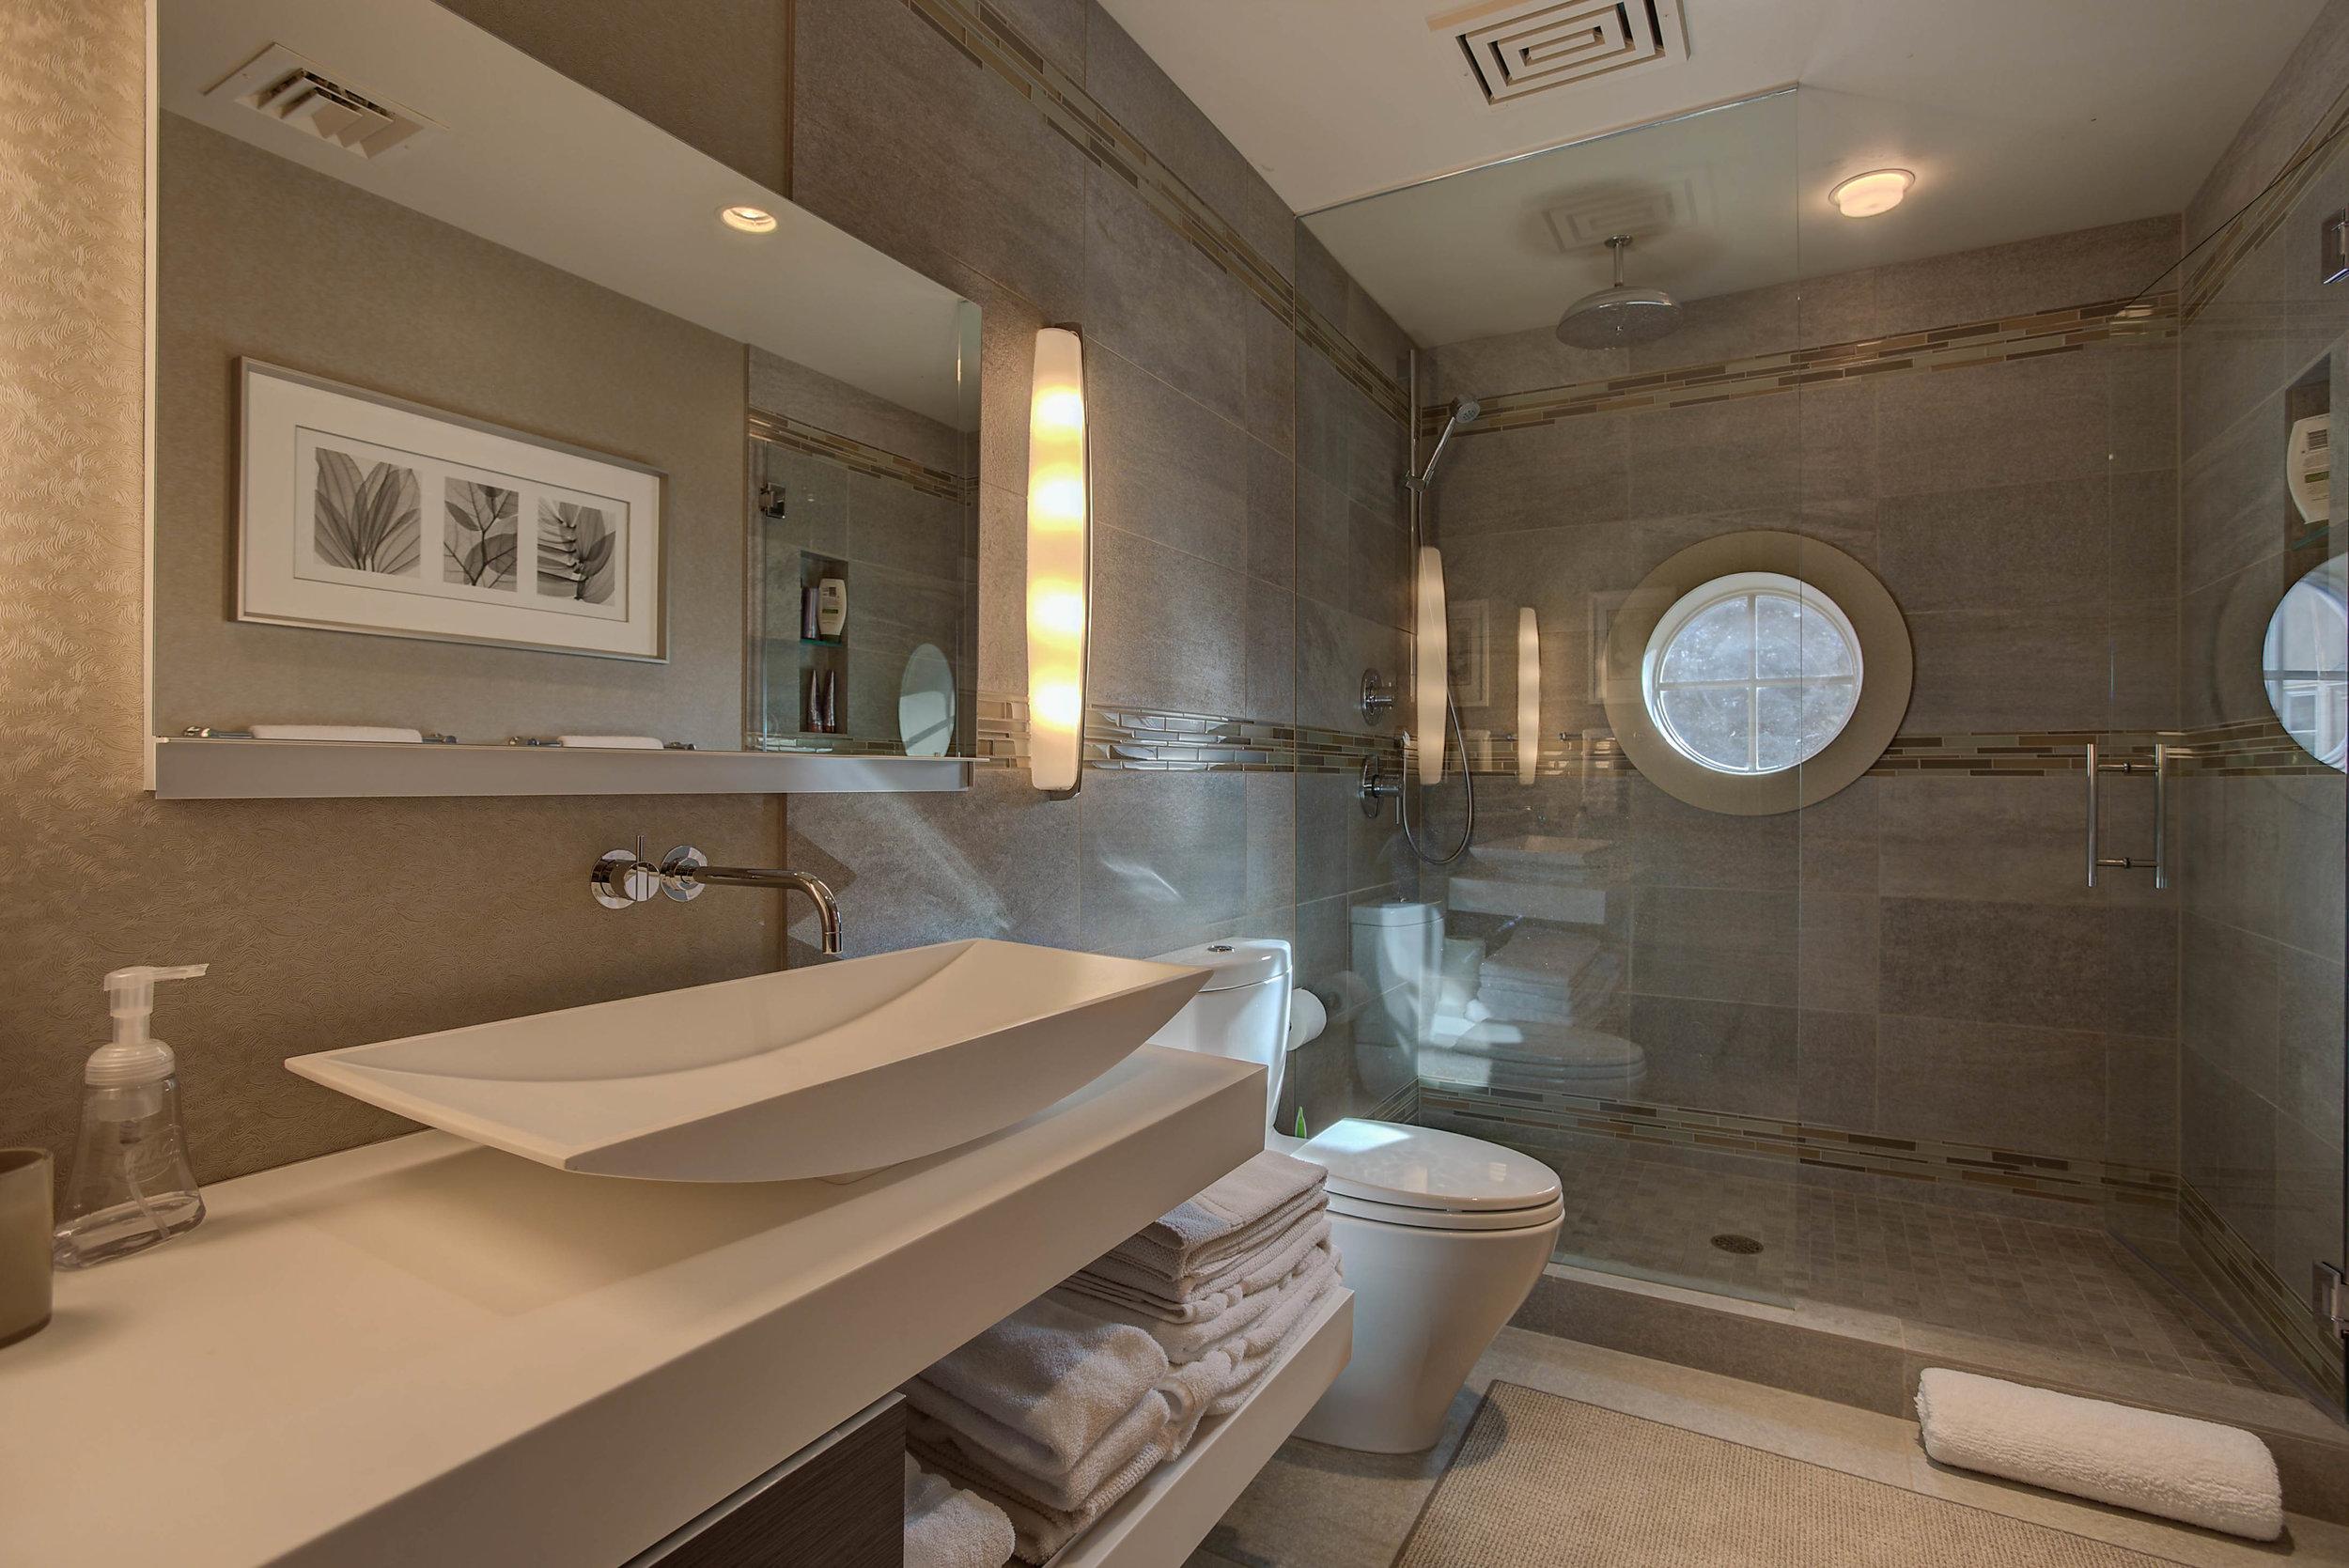 Joe Cocker_Bathroom4.jpg